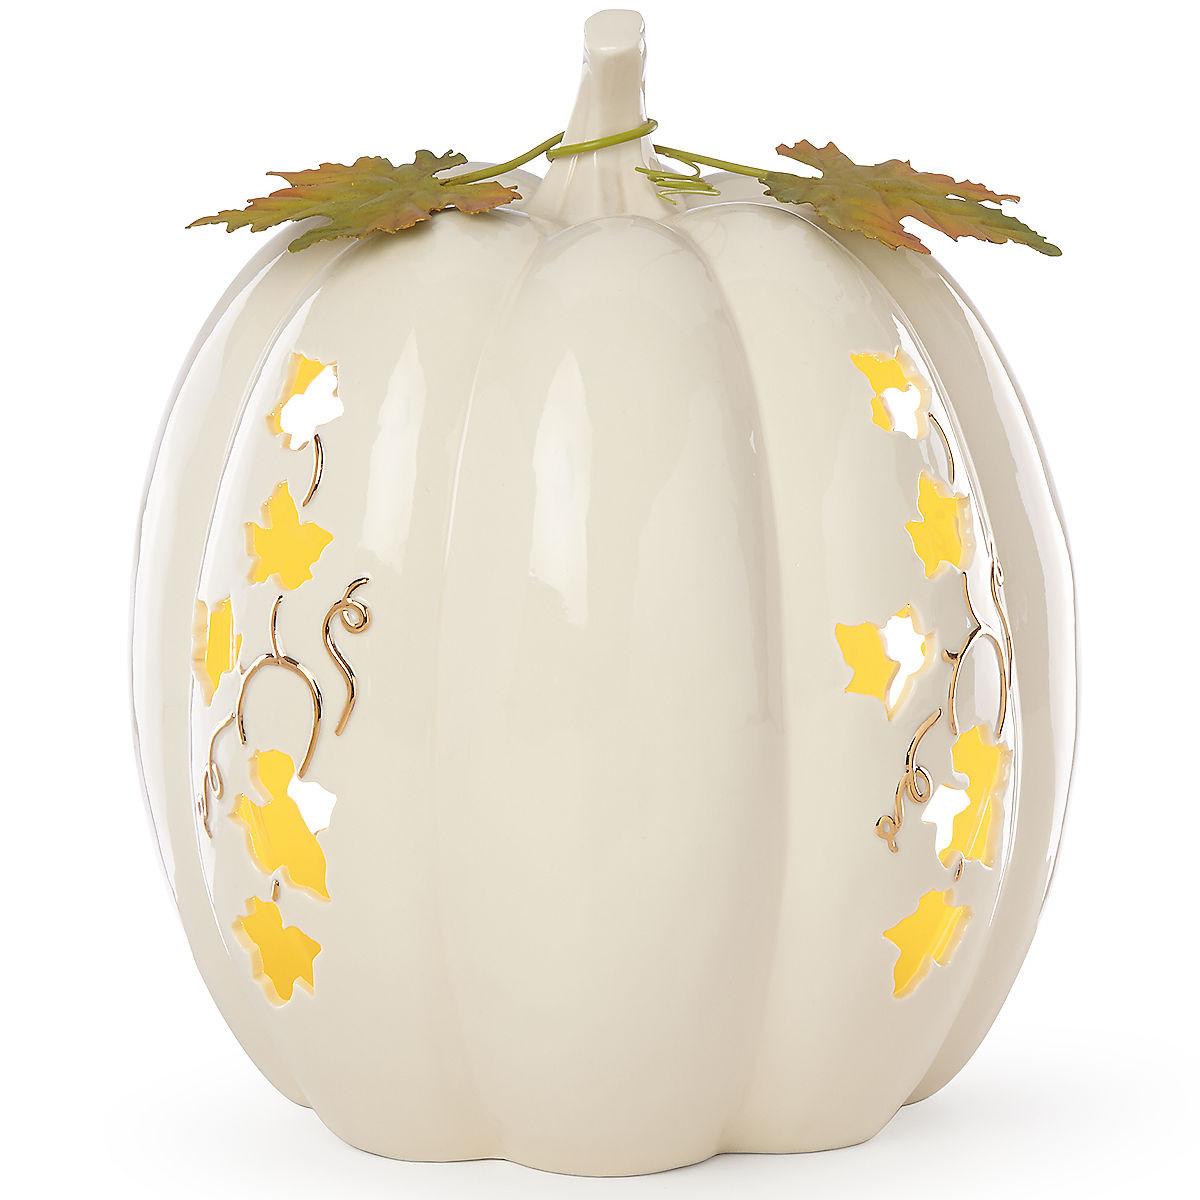 lenox holiday vase of lighted pumpkin large centerpiece harvest intended for lighted pumpkin large centerpiece